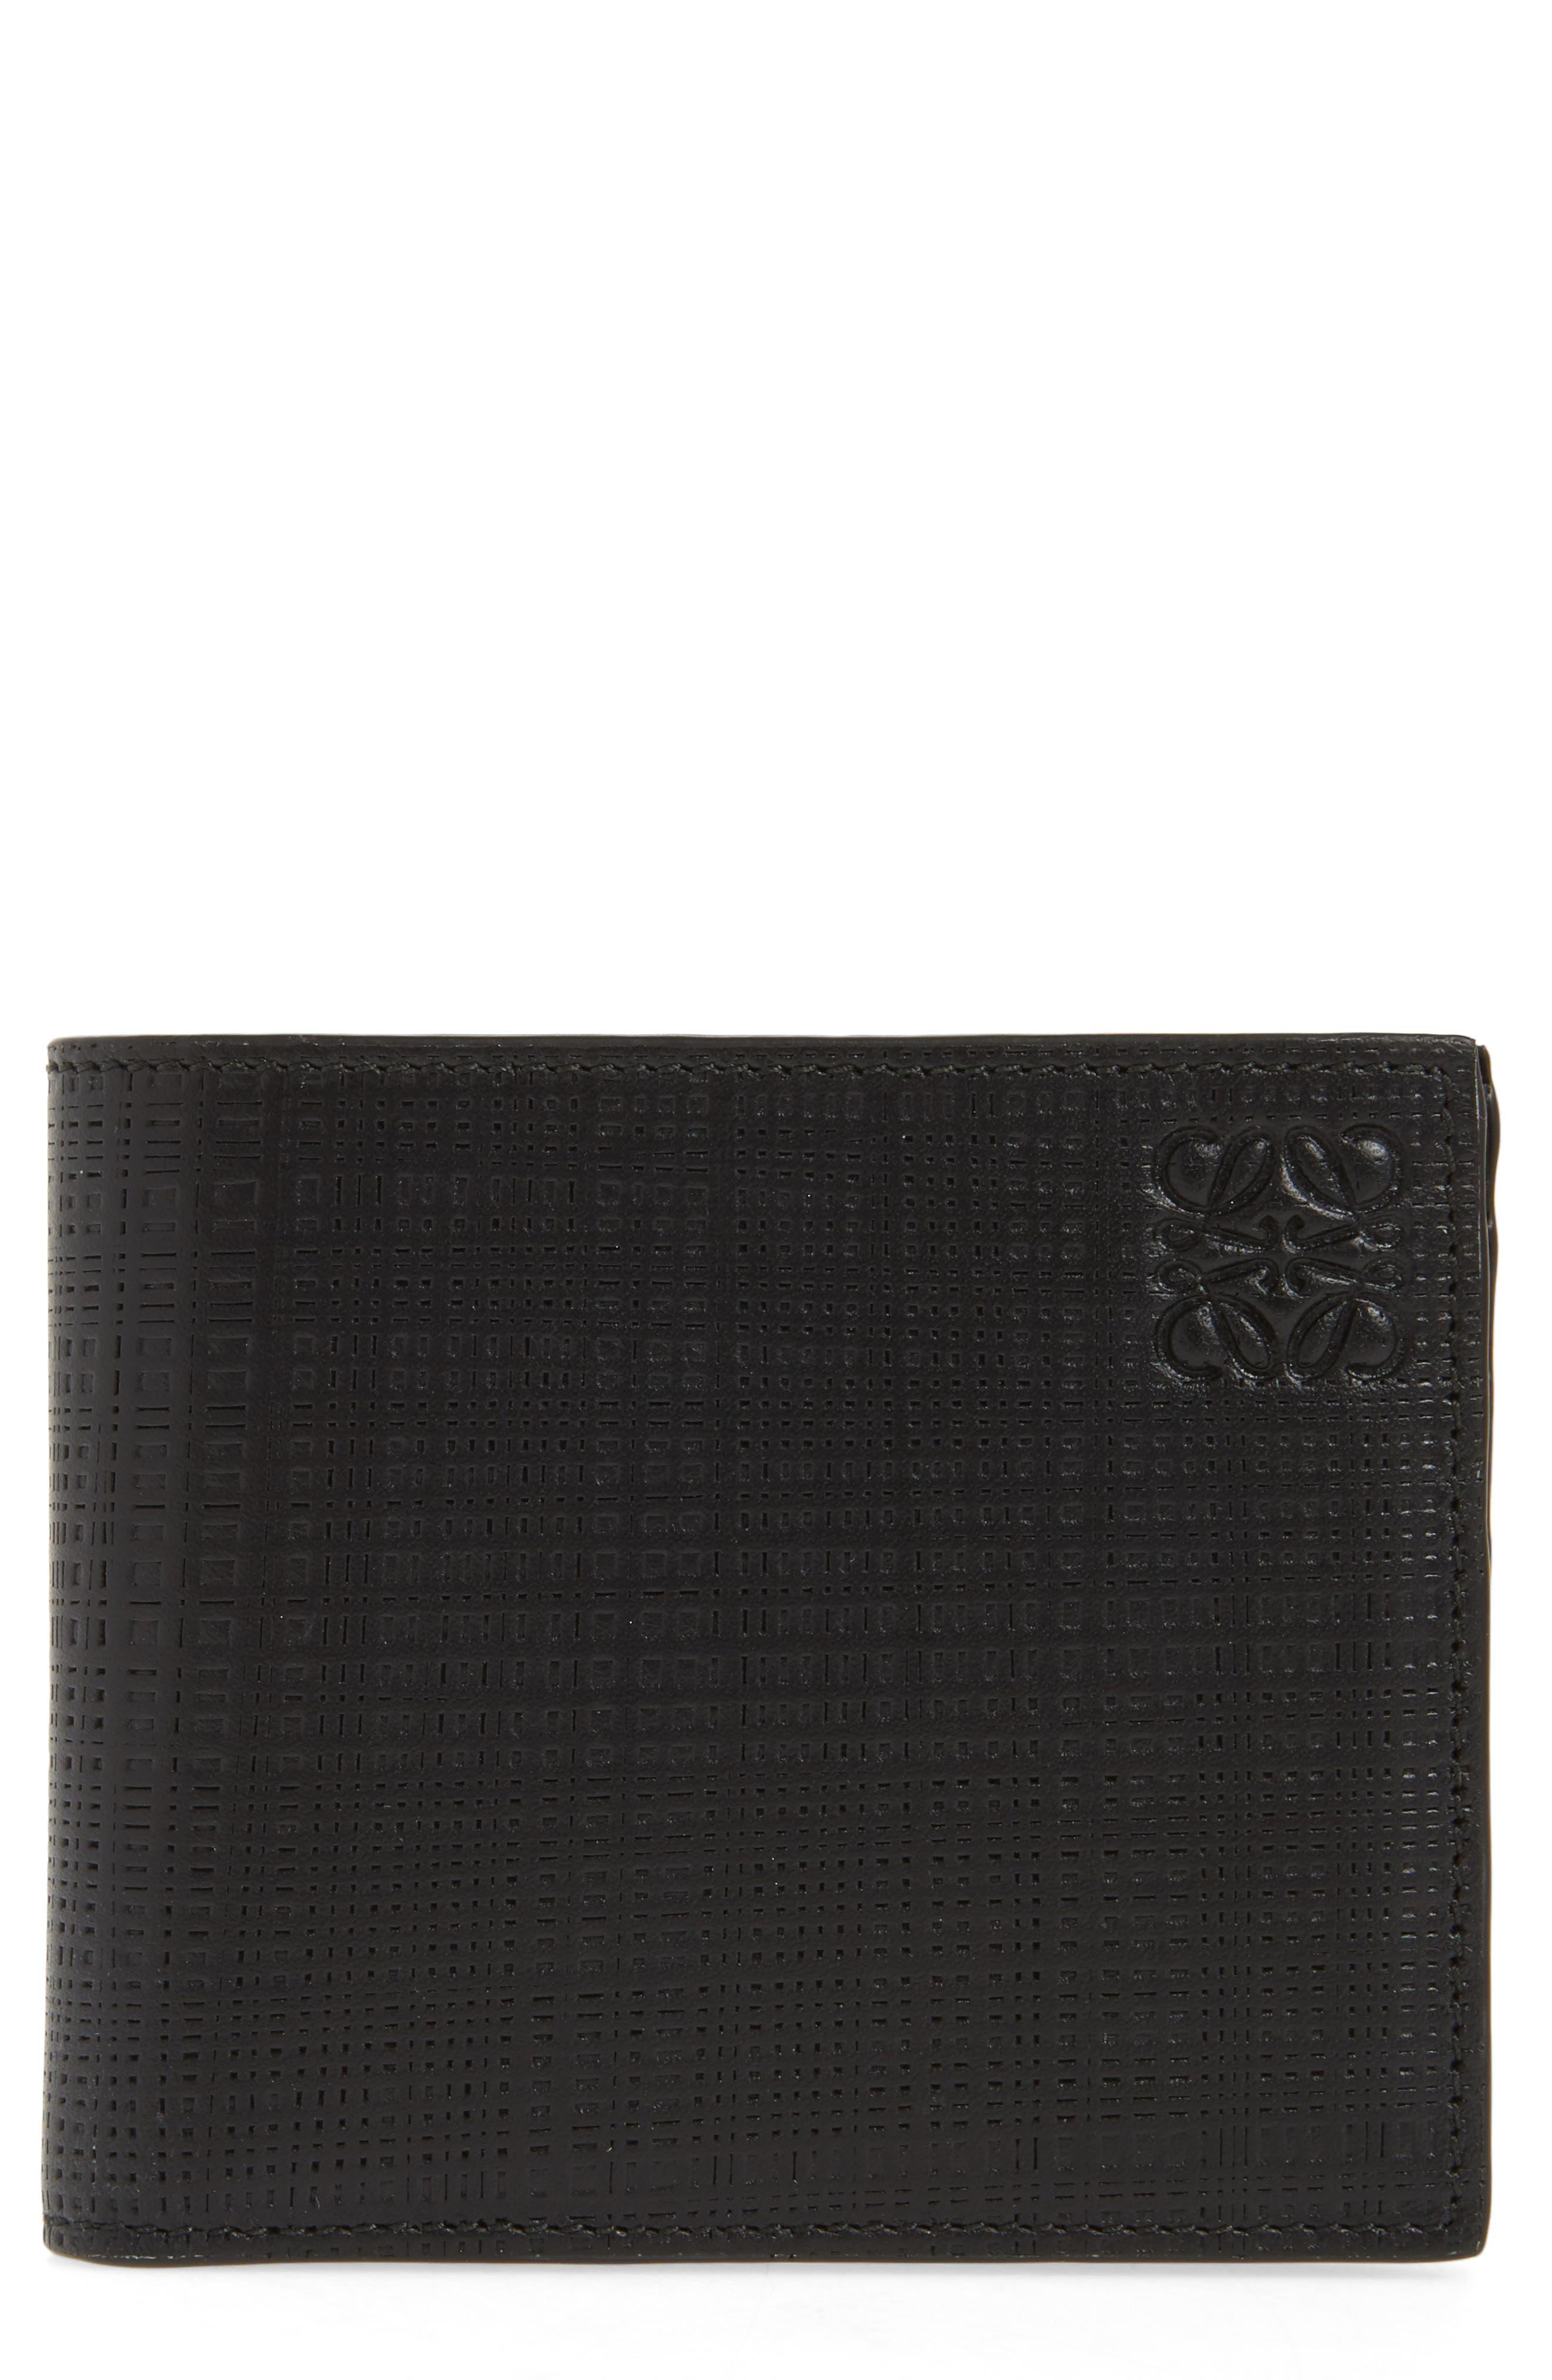 LOEWE Bifold Leather Wallet, Main, color, BLACK